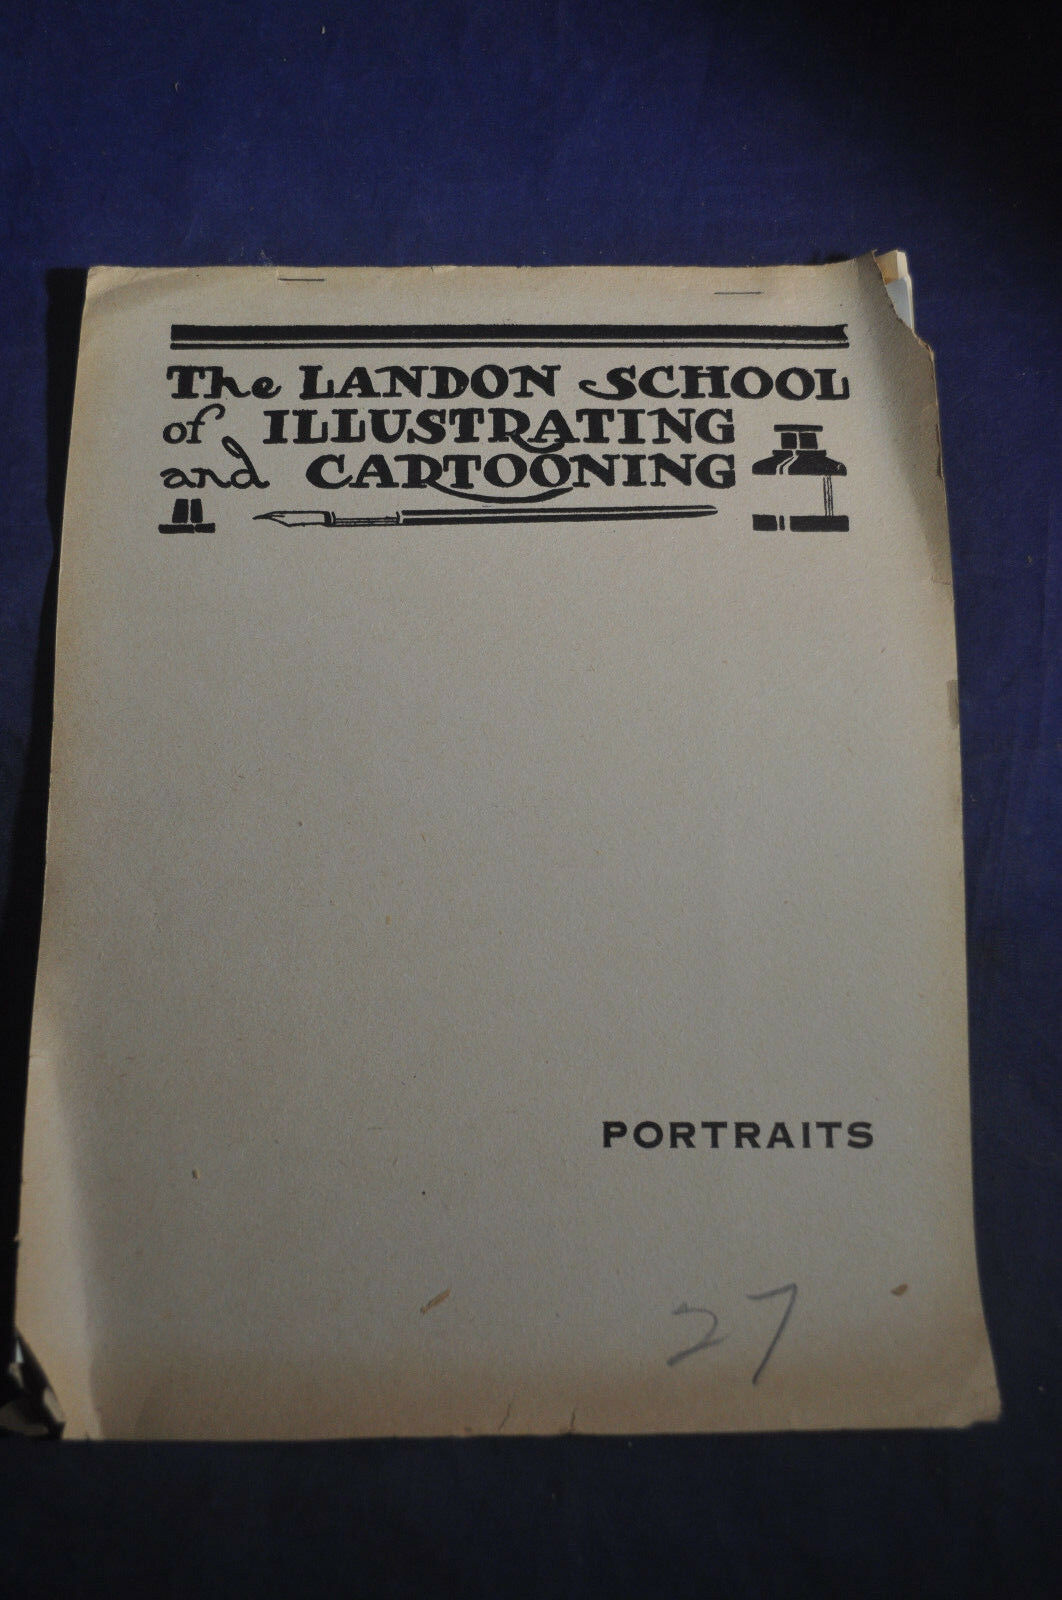 Ca 1918 *RARE EARLY* The Landon School of Illustrating & Cartooning, Portrai... 2